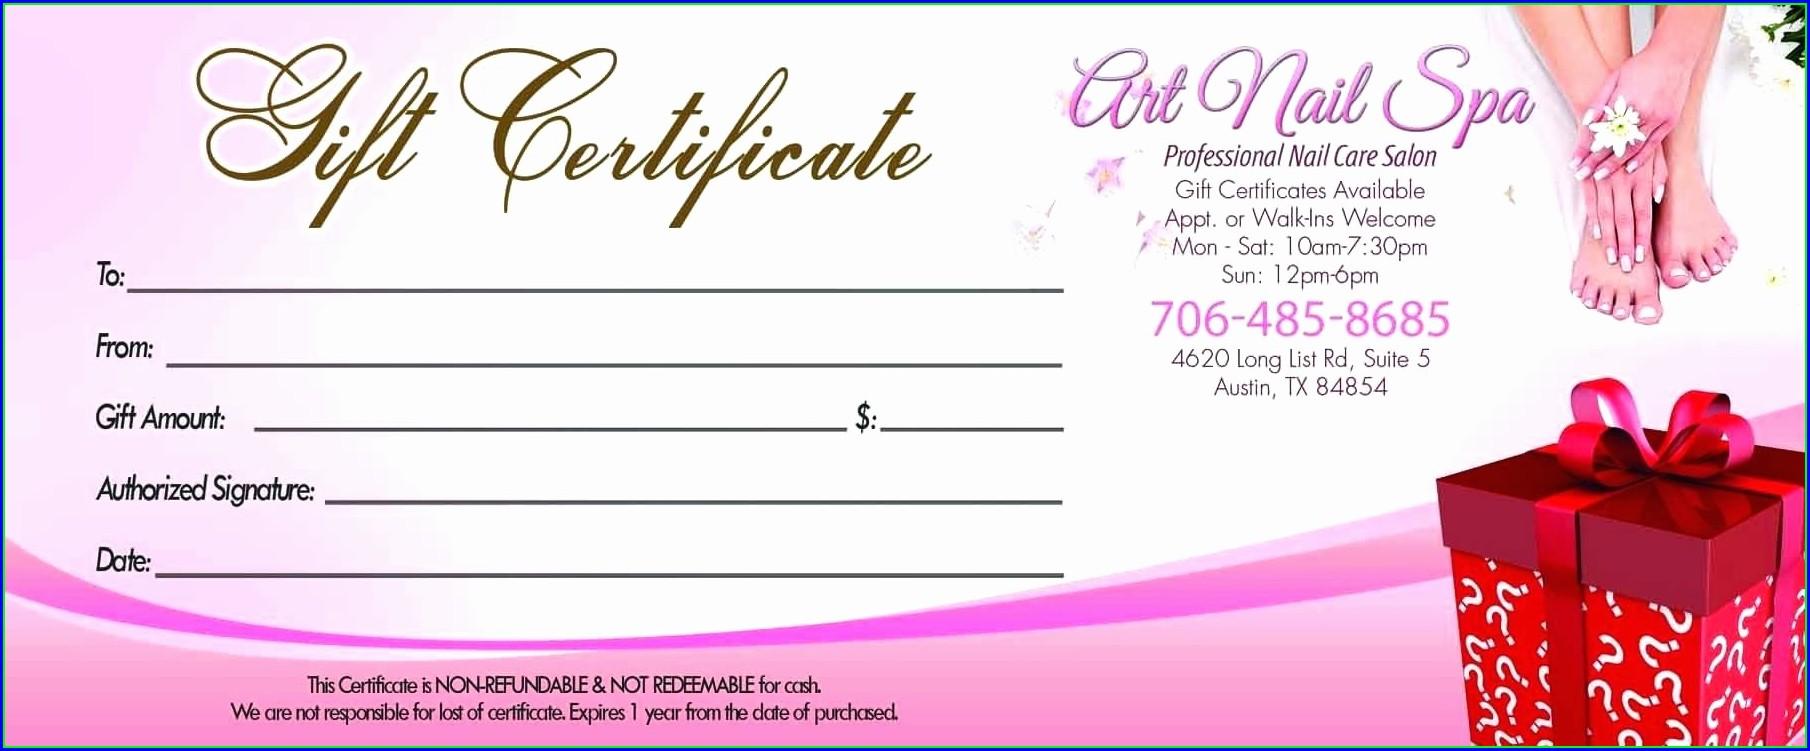 Hair Salon Gift Certificate Template Christmas